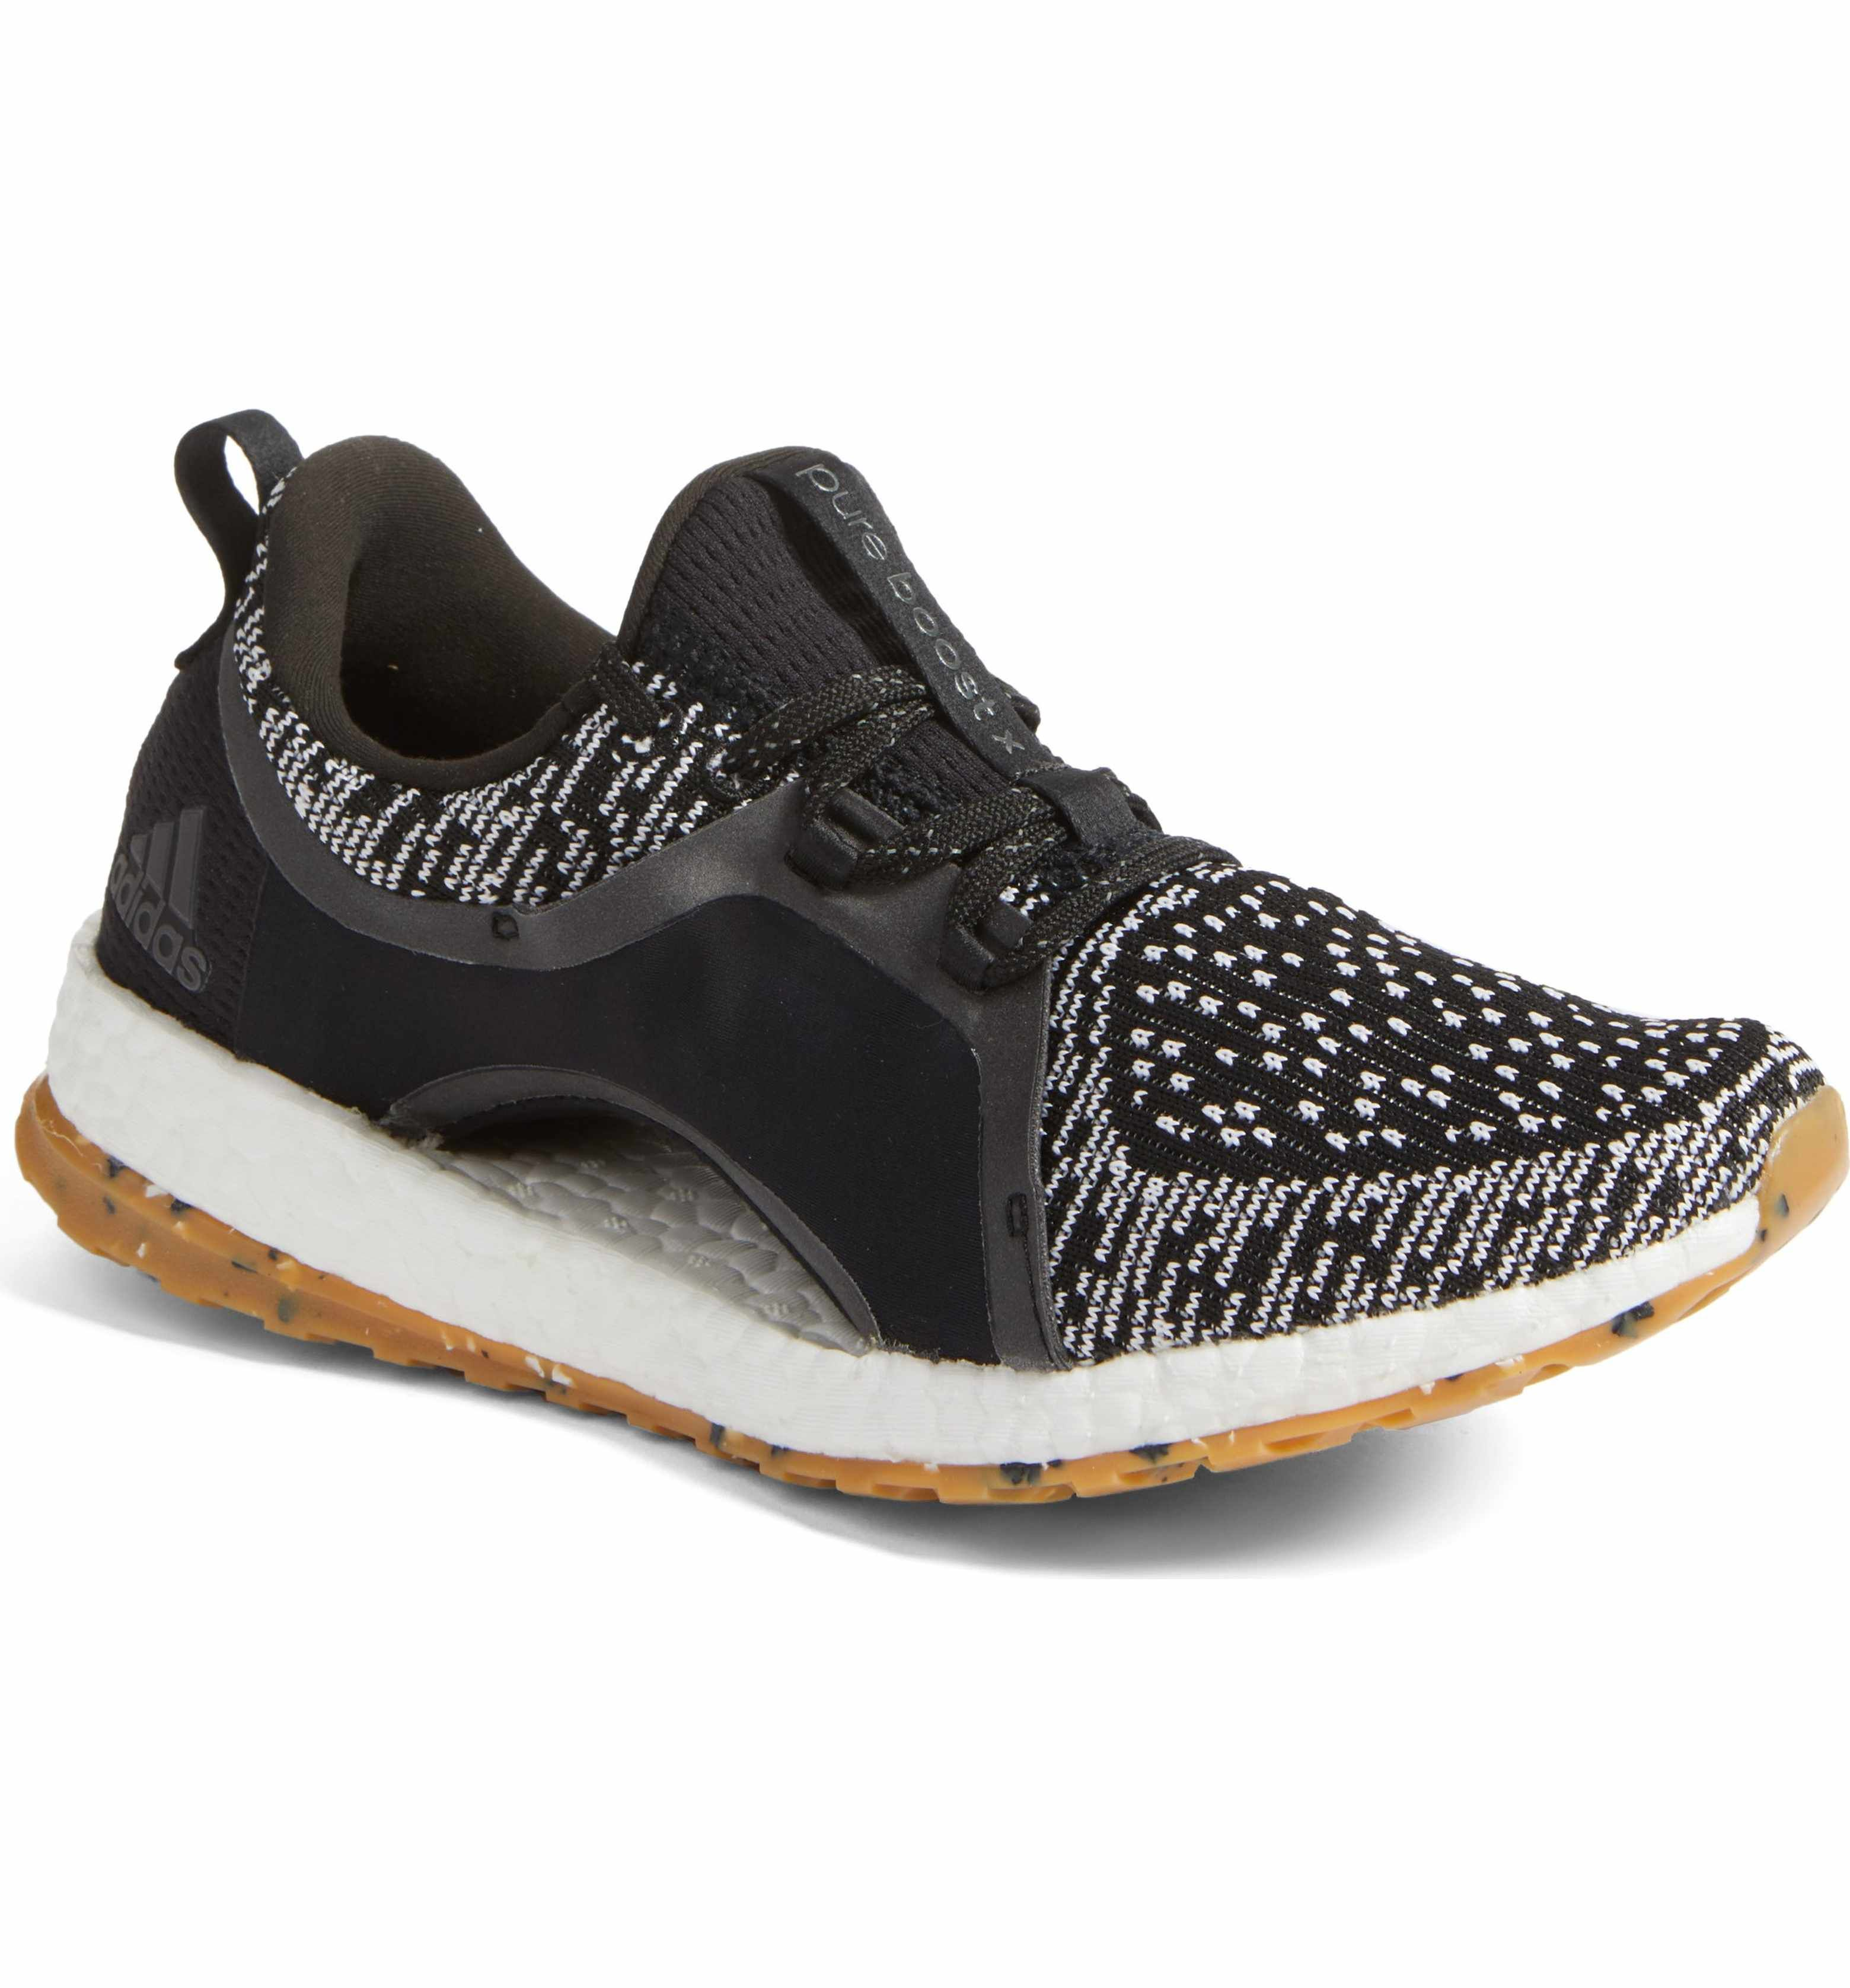 Main Image Adidas Pure Boost X Atr Running Shoe Women Addidas Shoes Women Womens Running Shoes Adidas Pure Boost